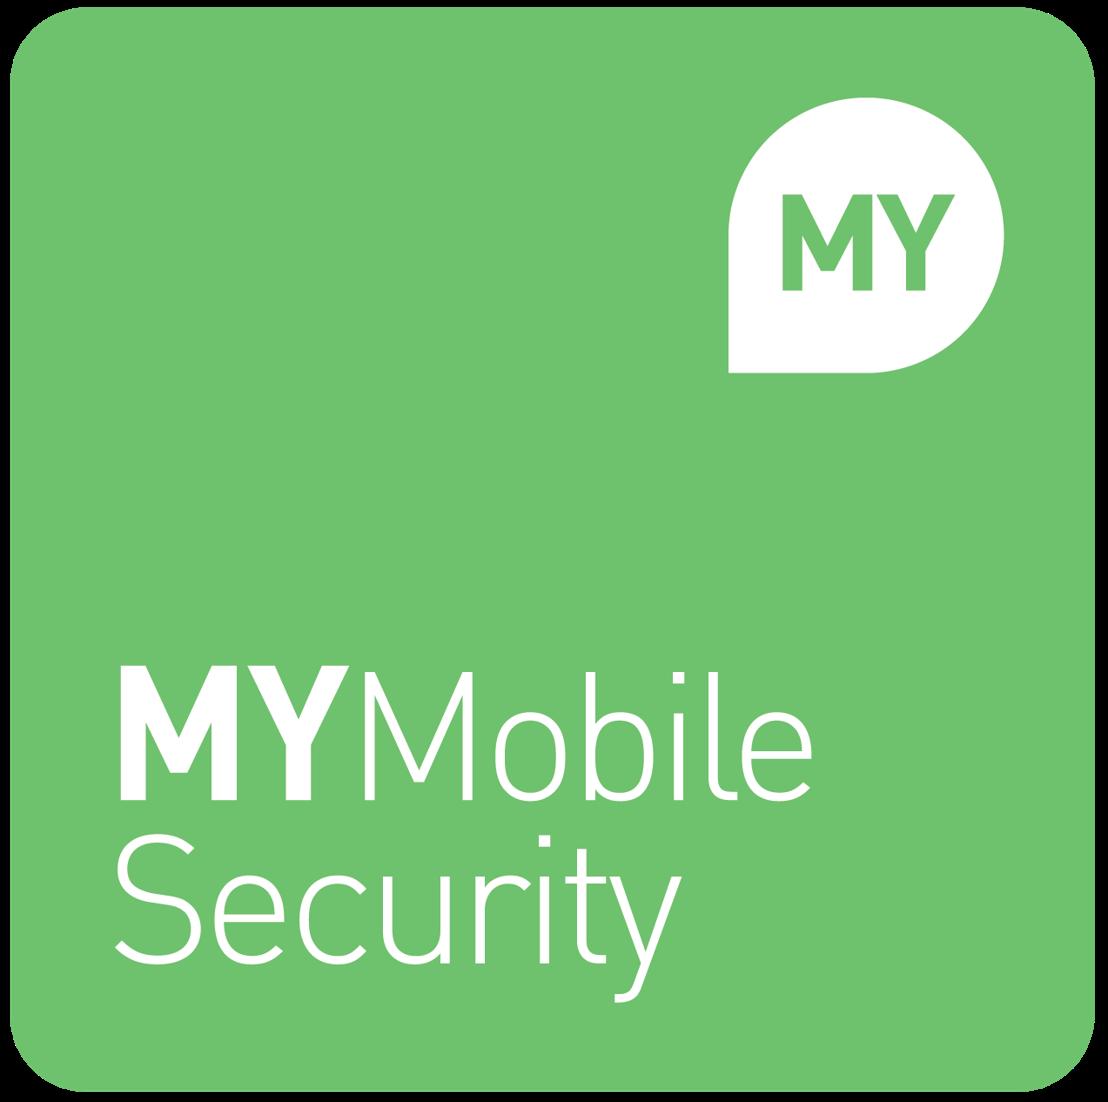 ⓒ MYMobileSecurity, 2015